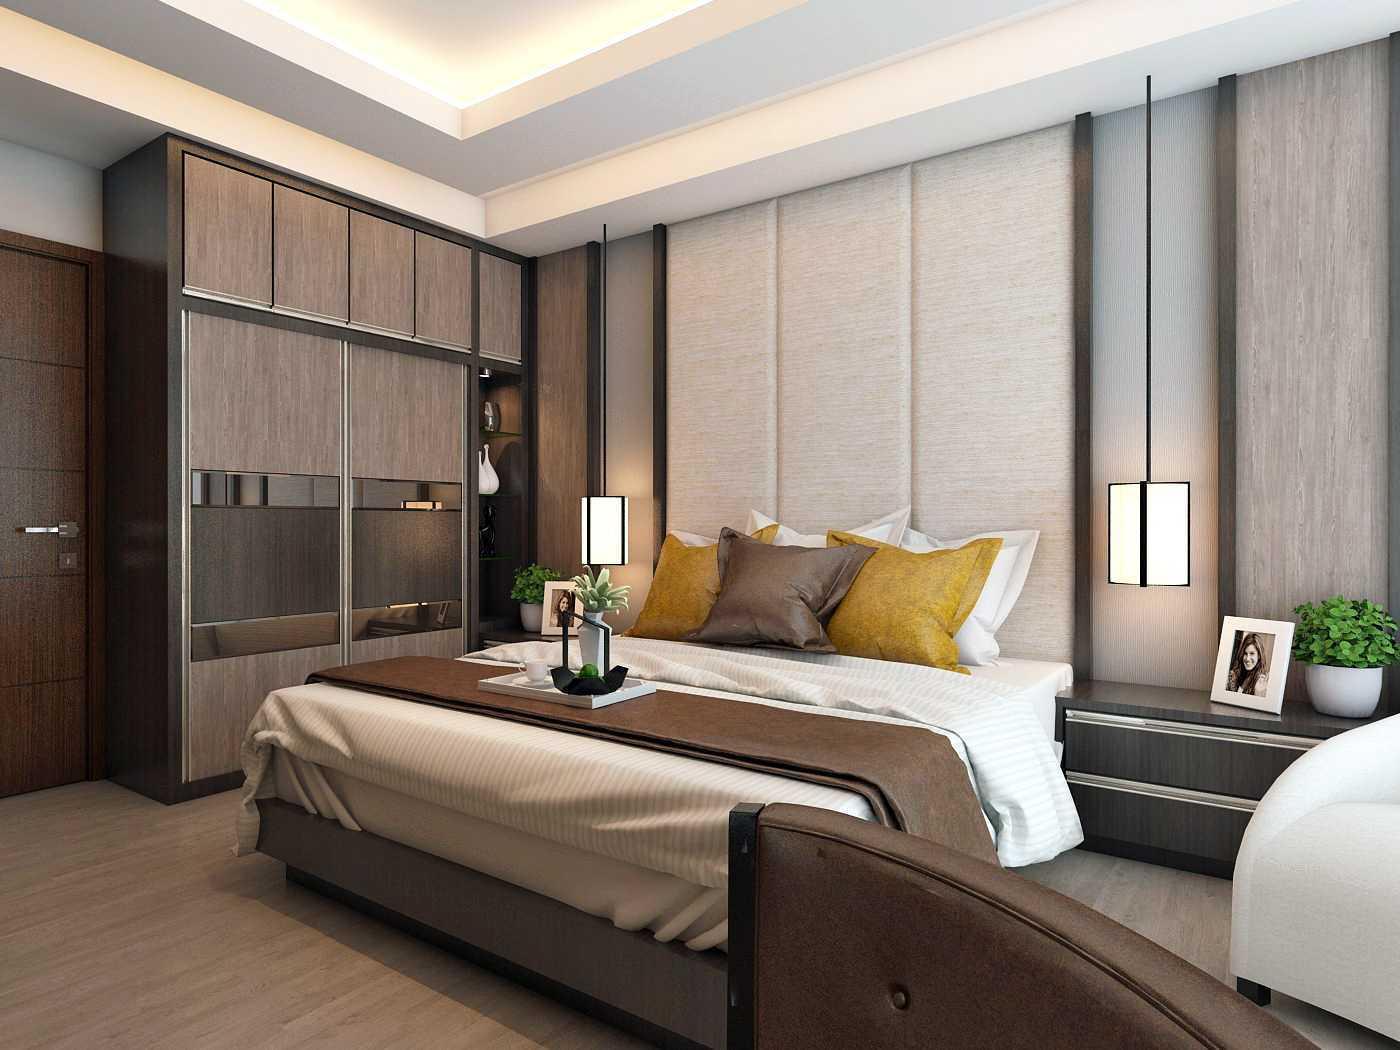 Habibullah Alfatih Condominium - Greenbay Pluit Jakarta, Indonesia Jakarta, Indonesia Master-Bedroom-4 Kontemporer  35910